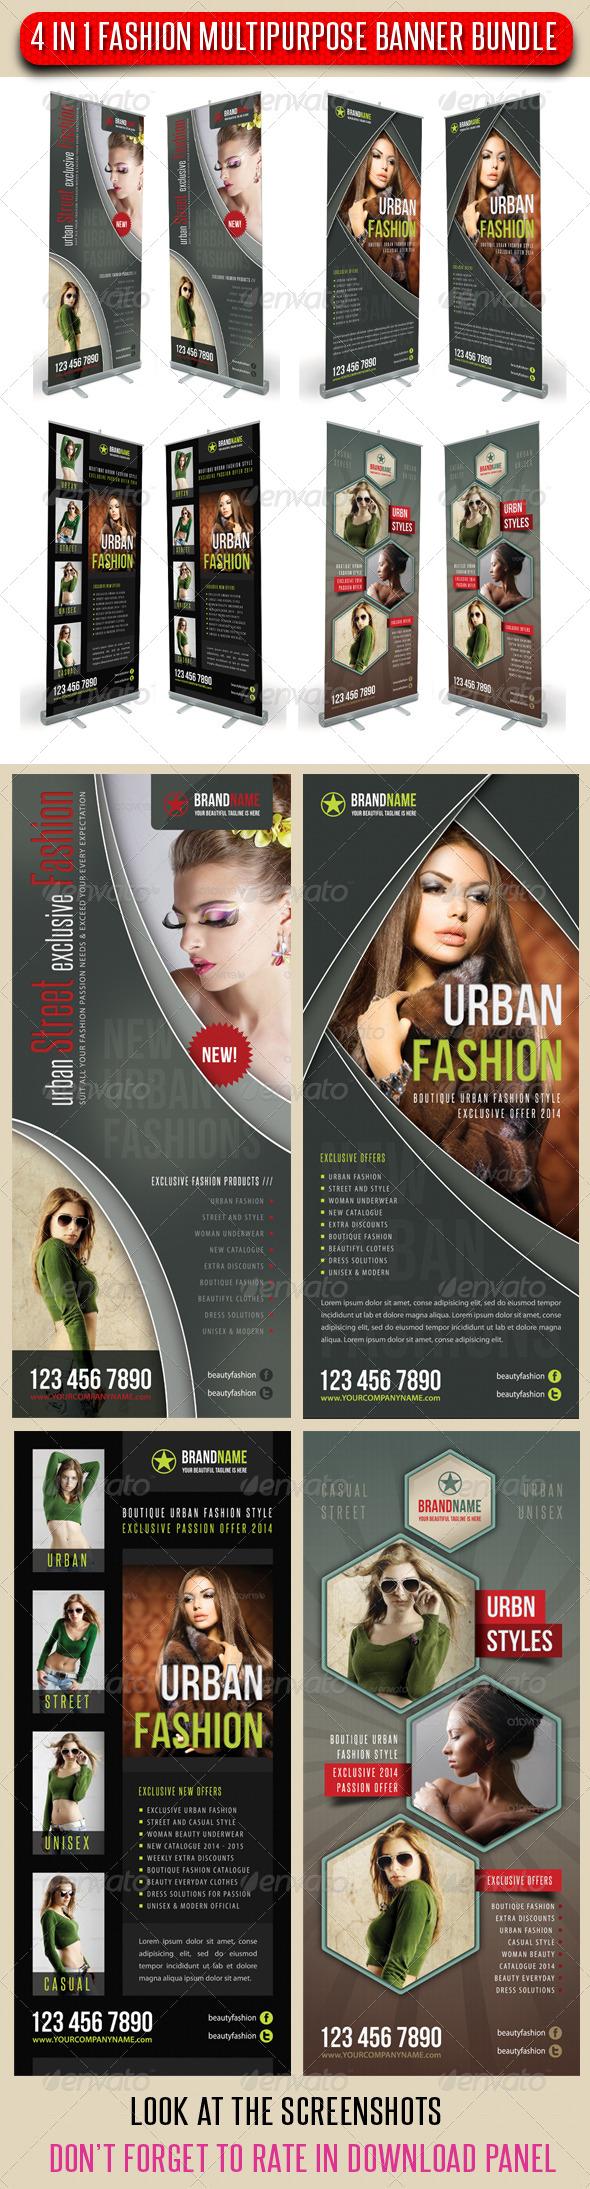 4 in 1 Fashion Multipurpose Banner Bundle 07 - Signage Print Templates